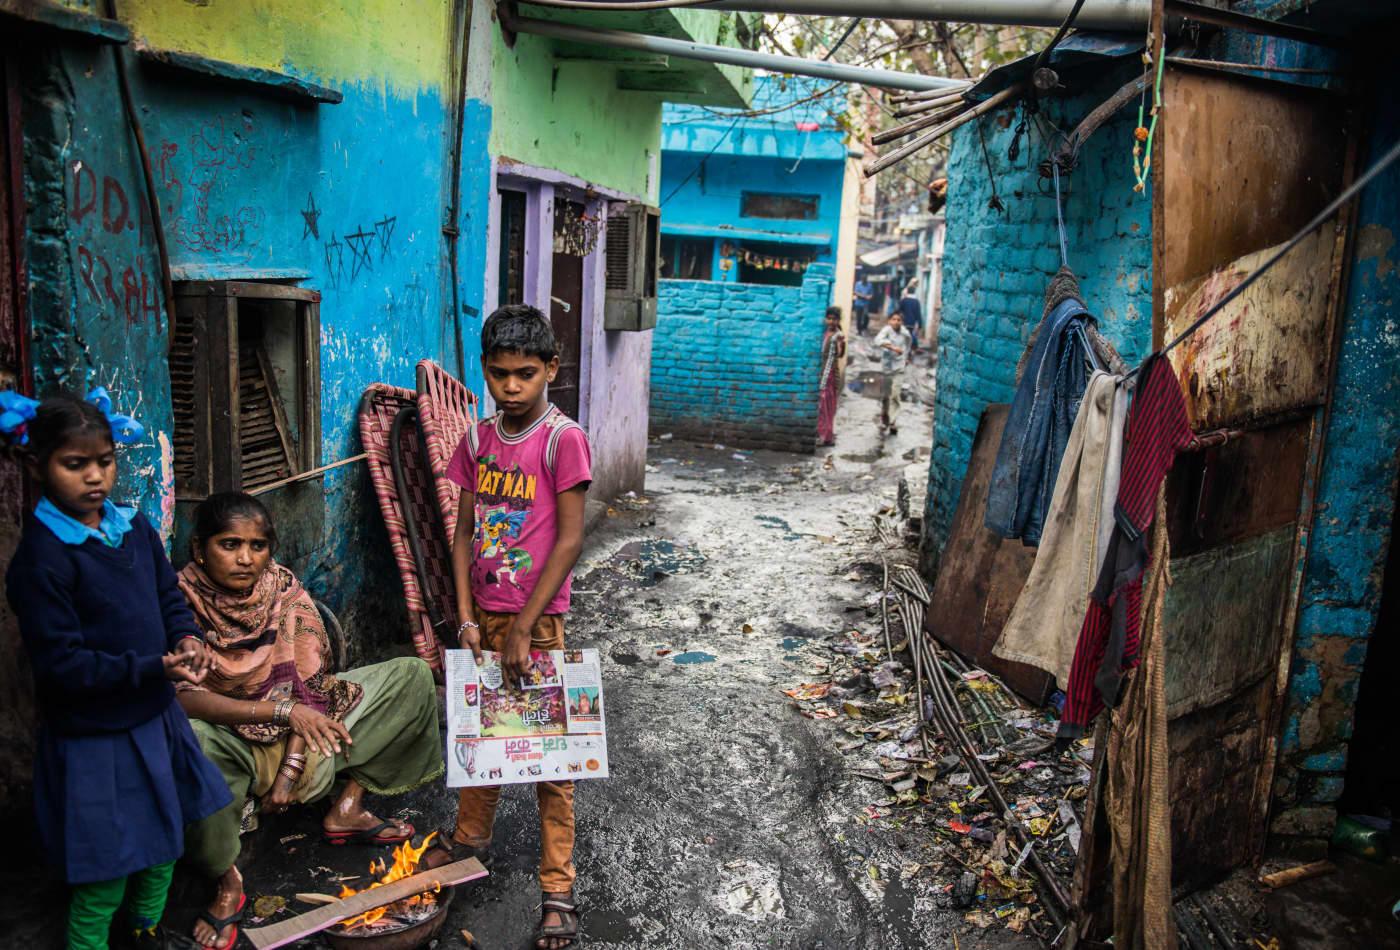 Coronavirus could push half a billion more people into poverty globally, UN warns